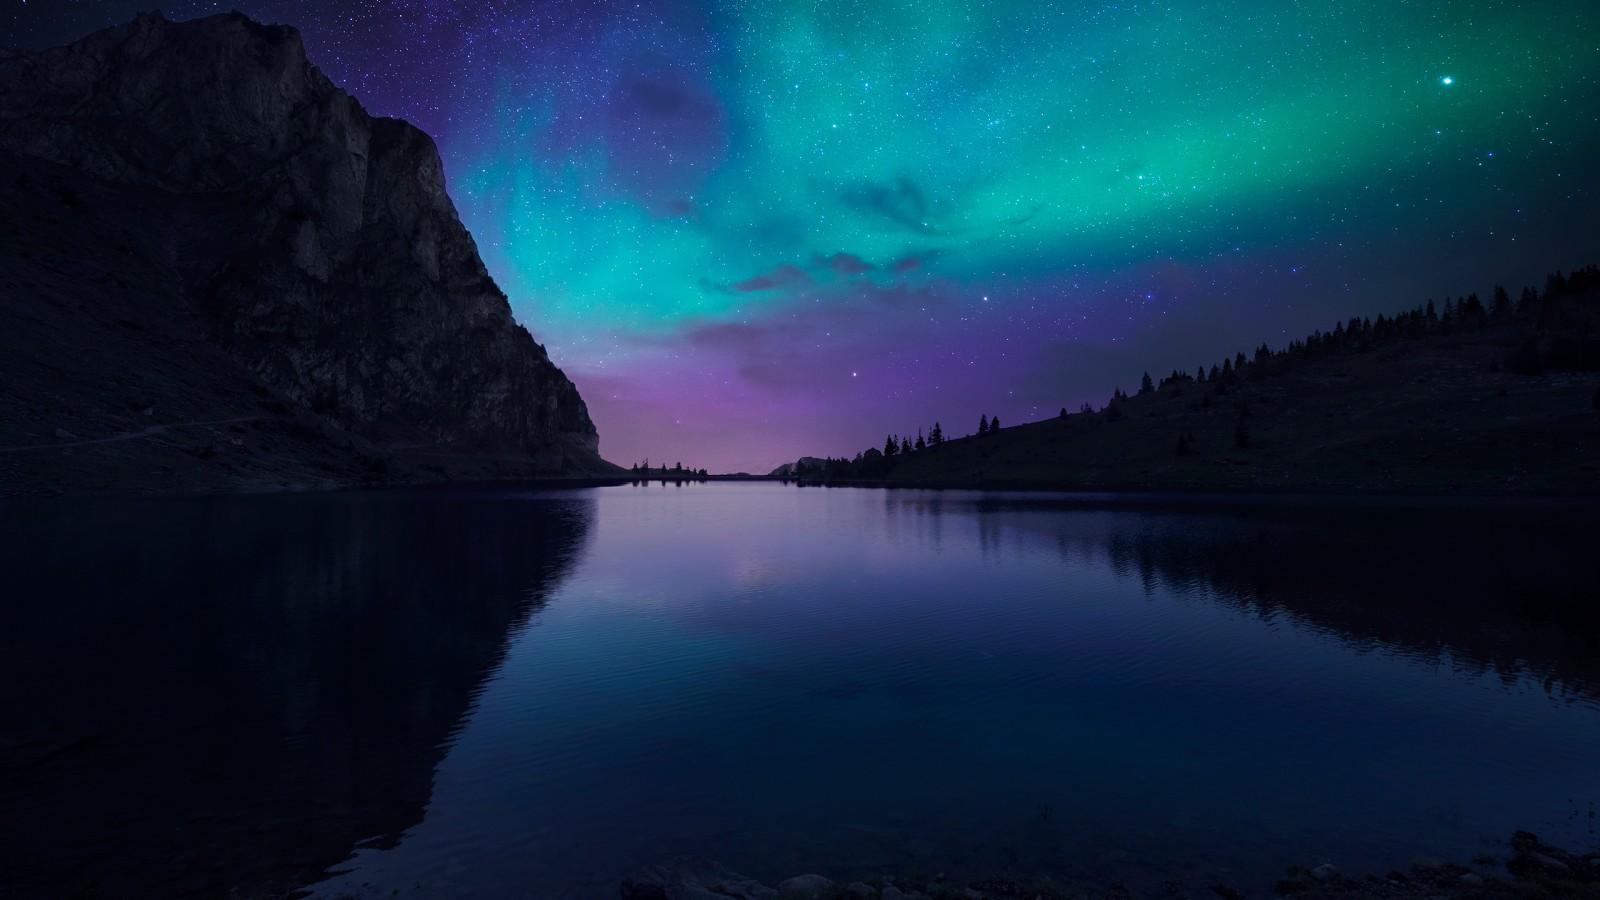 Cute Wallpapers For Desktop 3d Aurora Borealis Atmosphere Wallpapers Hd Wallpapers Id